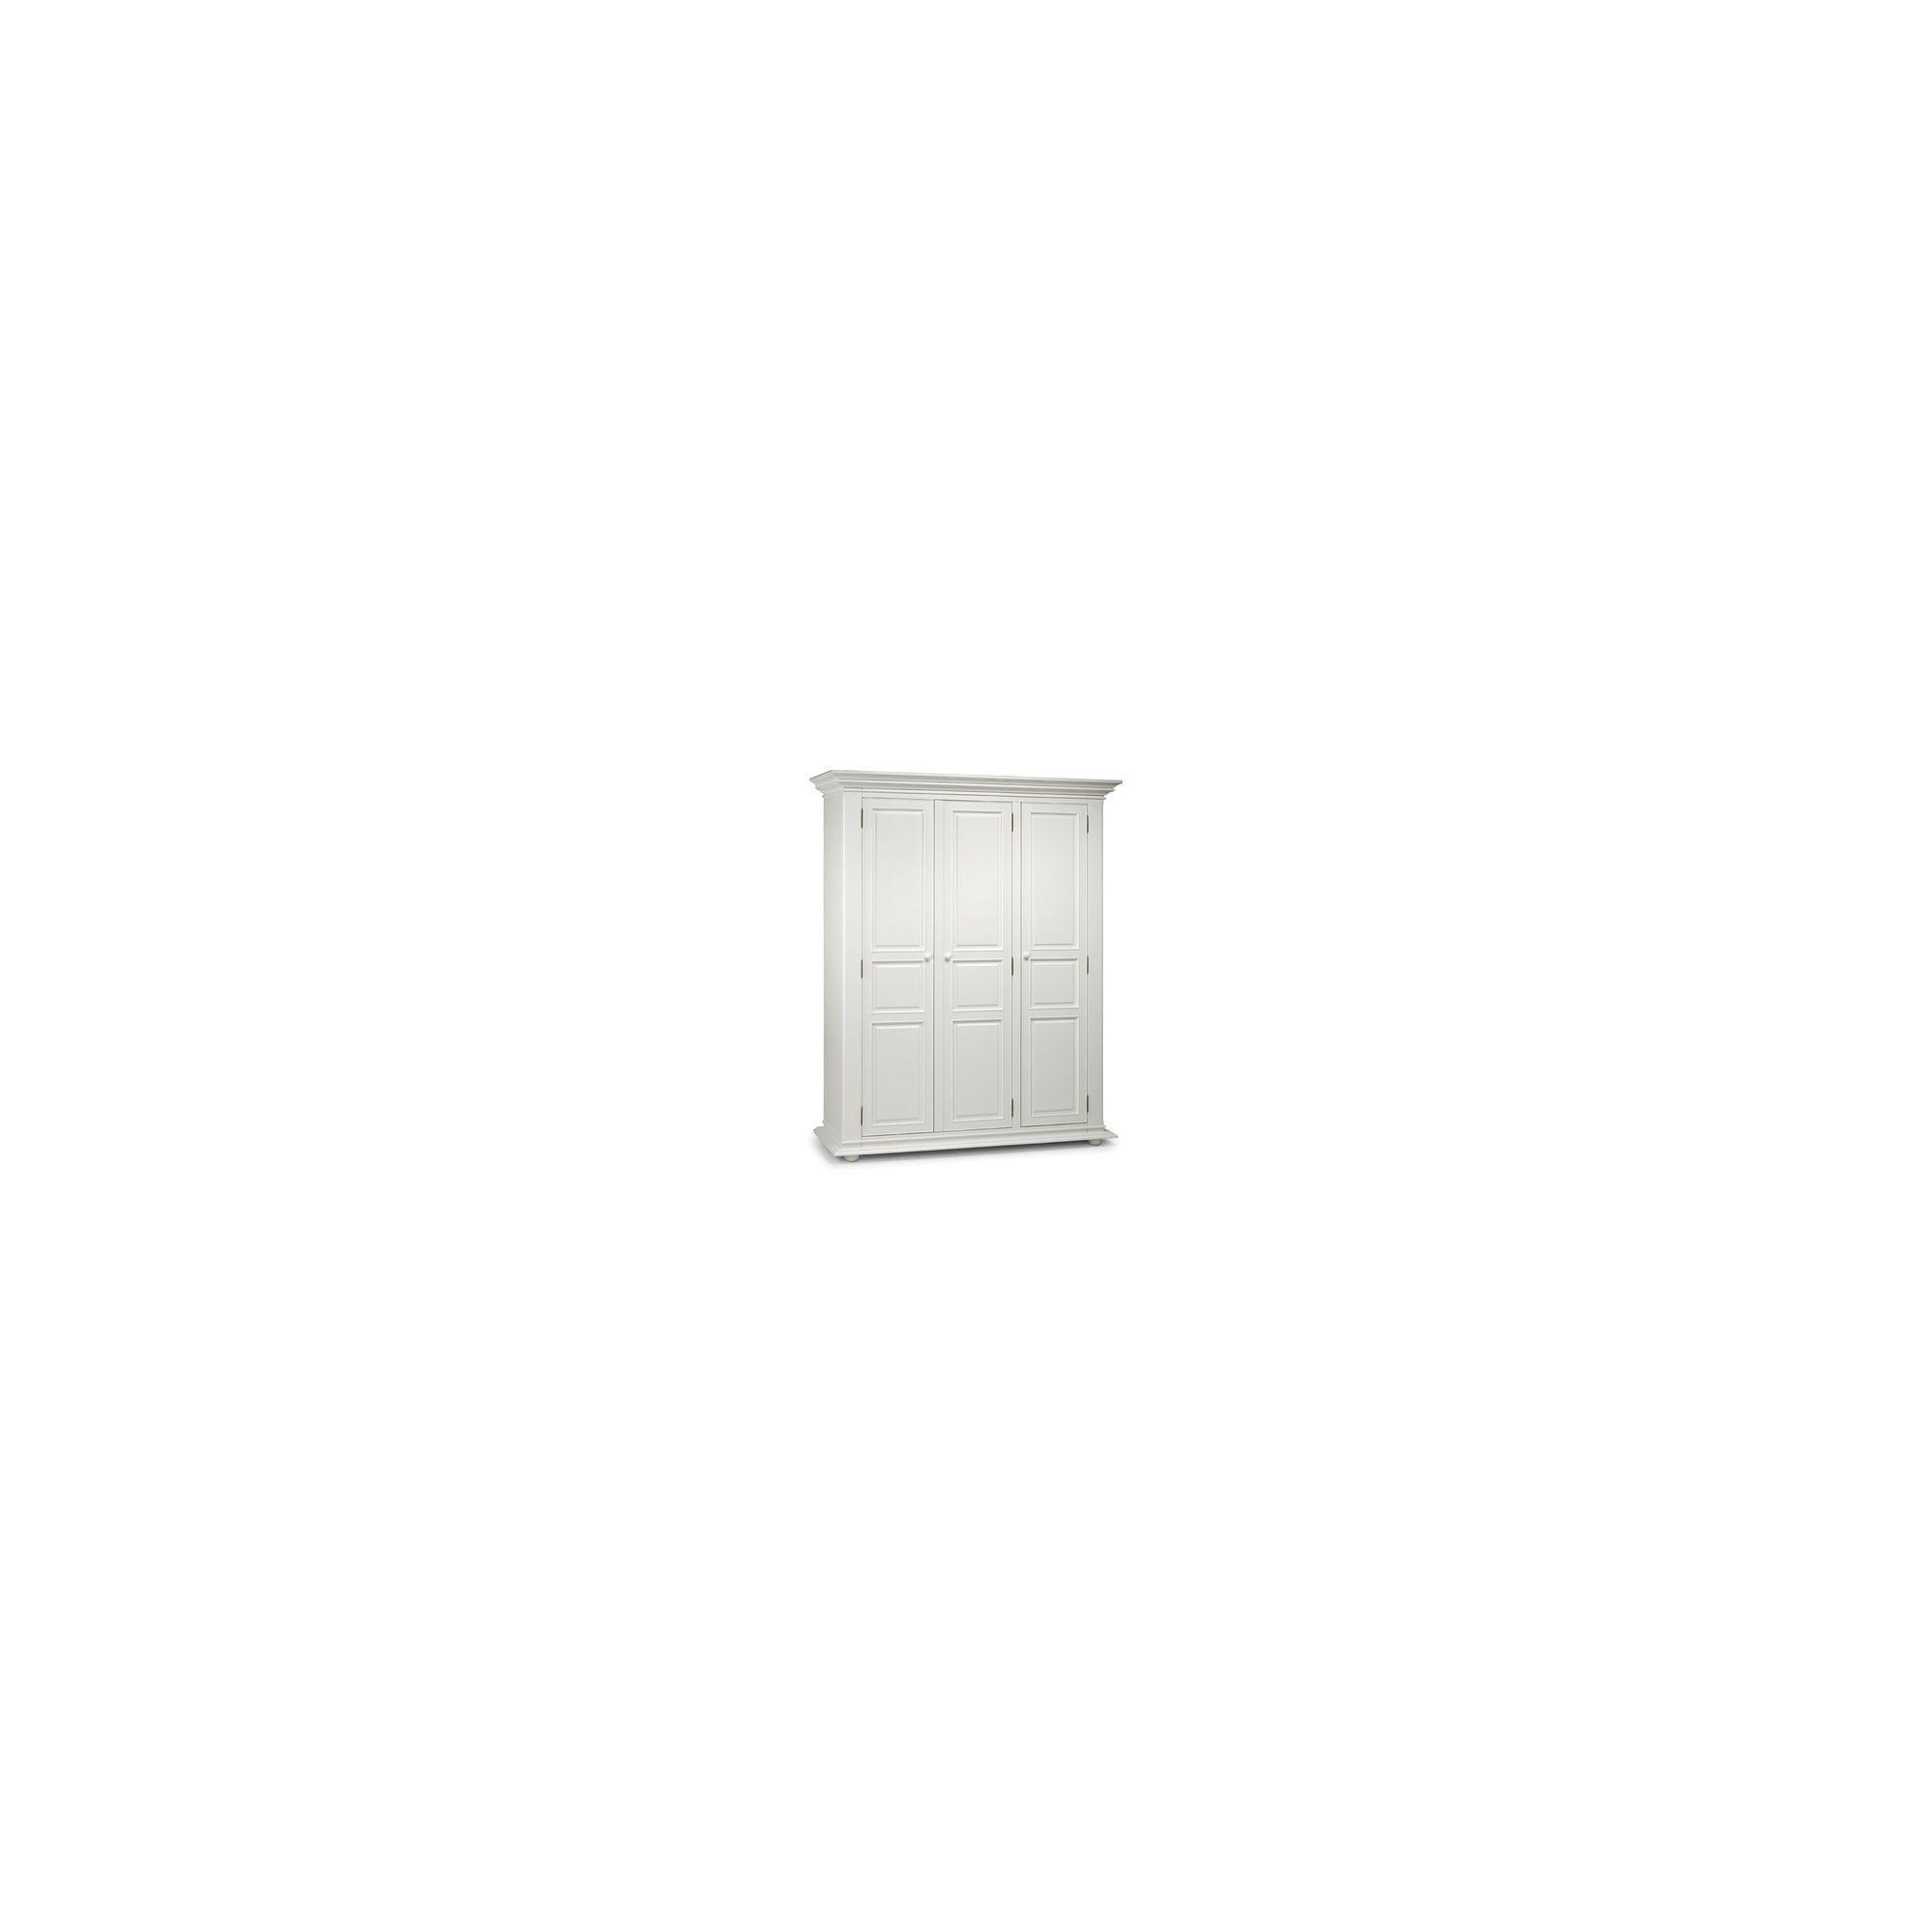 Julian Bowen Josephine 3 Door Wardrobe in Off White at Tesco Direct